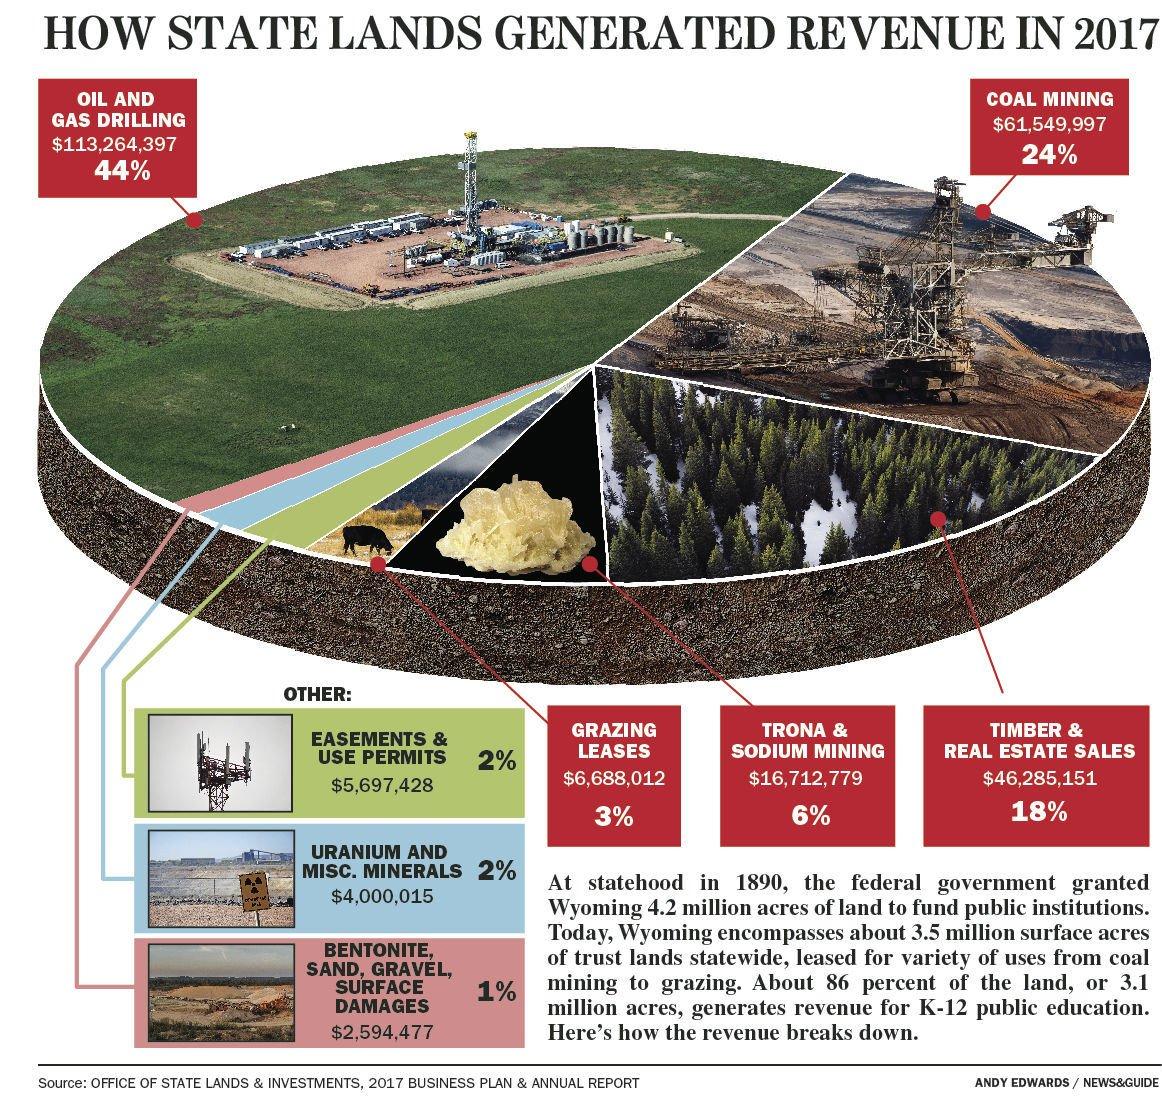 State Trust Lands